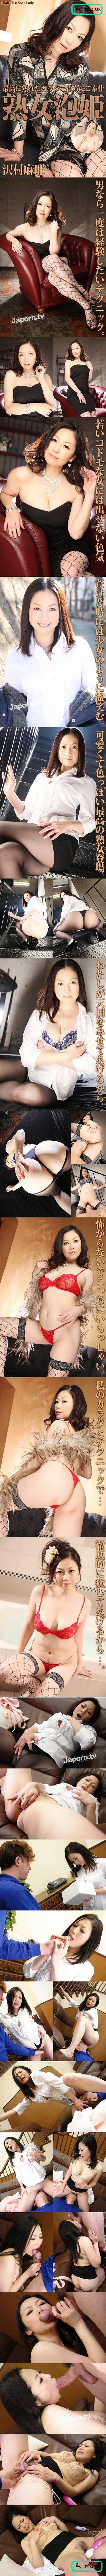 [PT 82] High Class Soap Lady : Maya Sawamura 沢村麻耶 PT Maya Sawamura